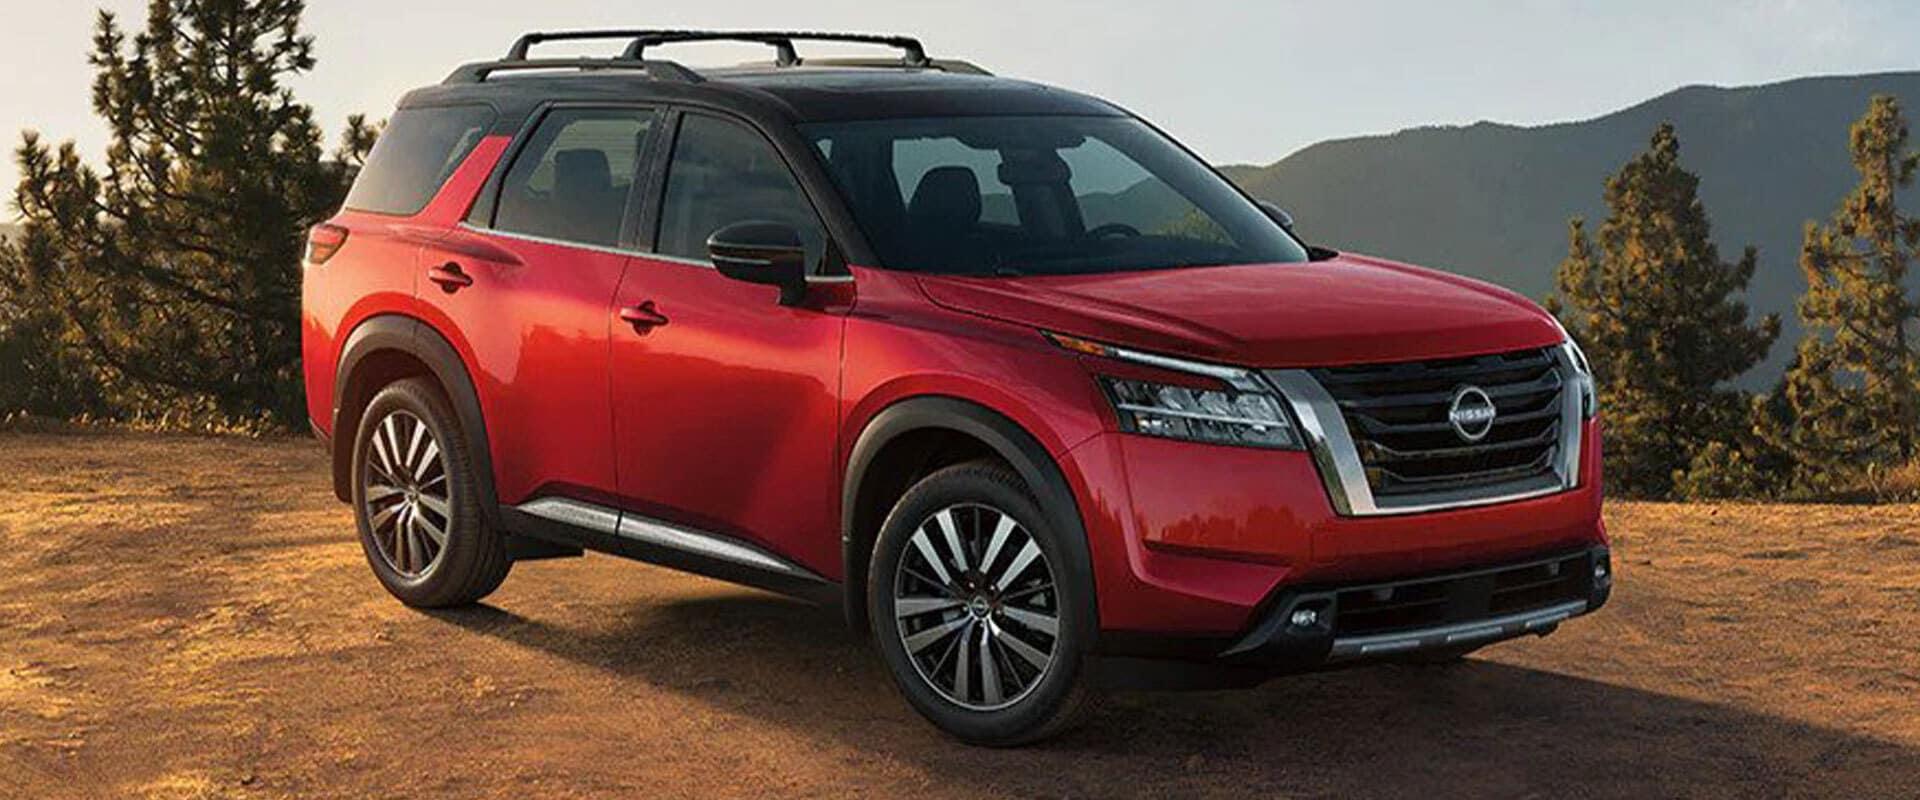 2022 Nissan Pathfinder For Sale In Greenville